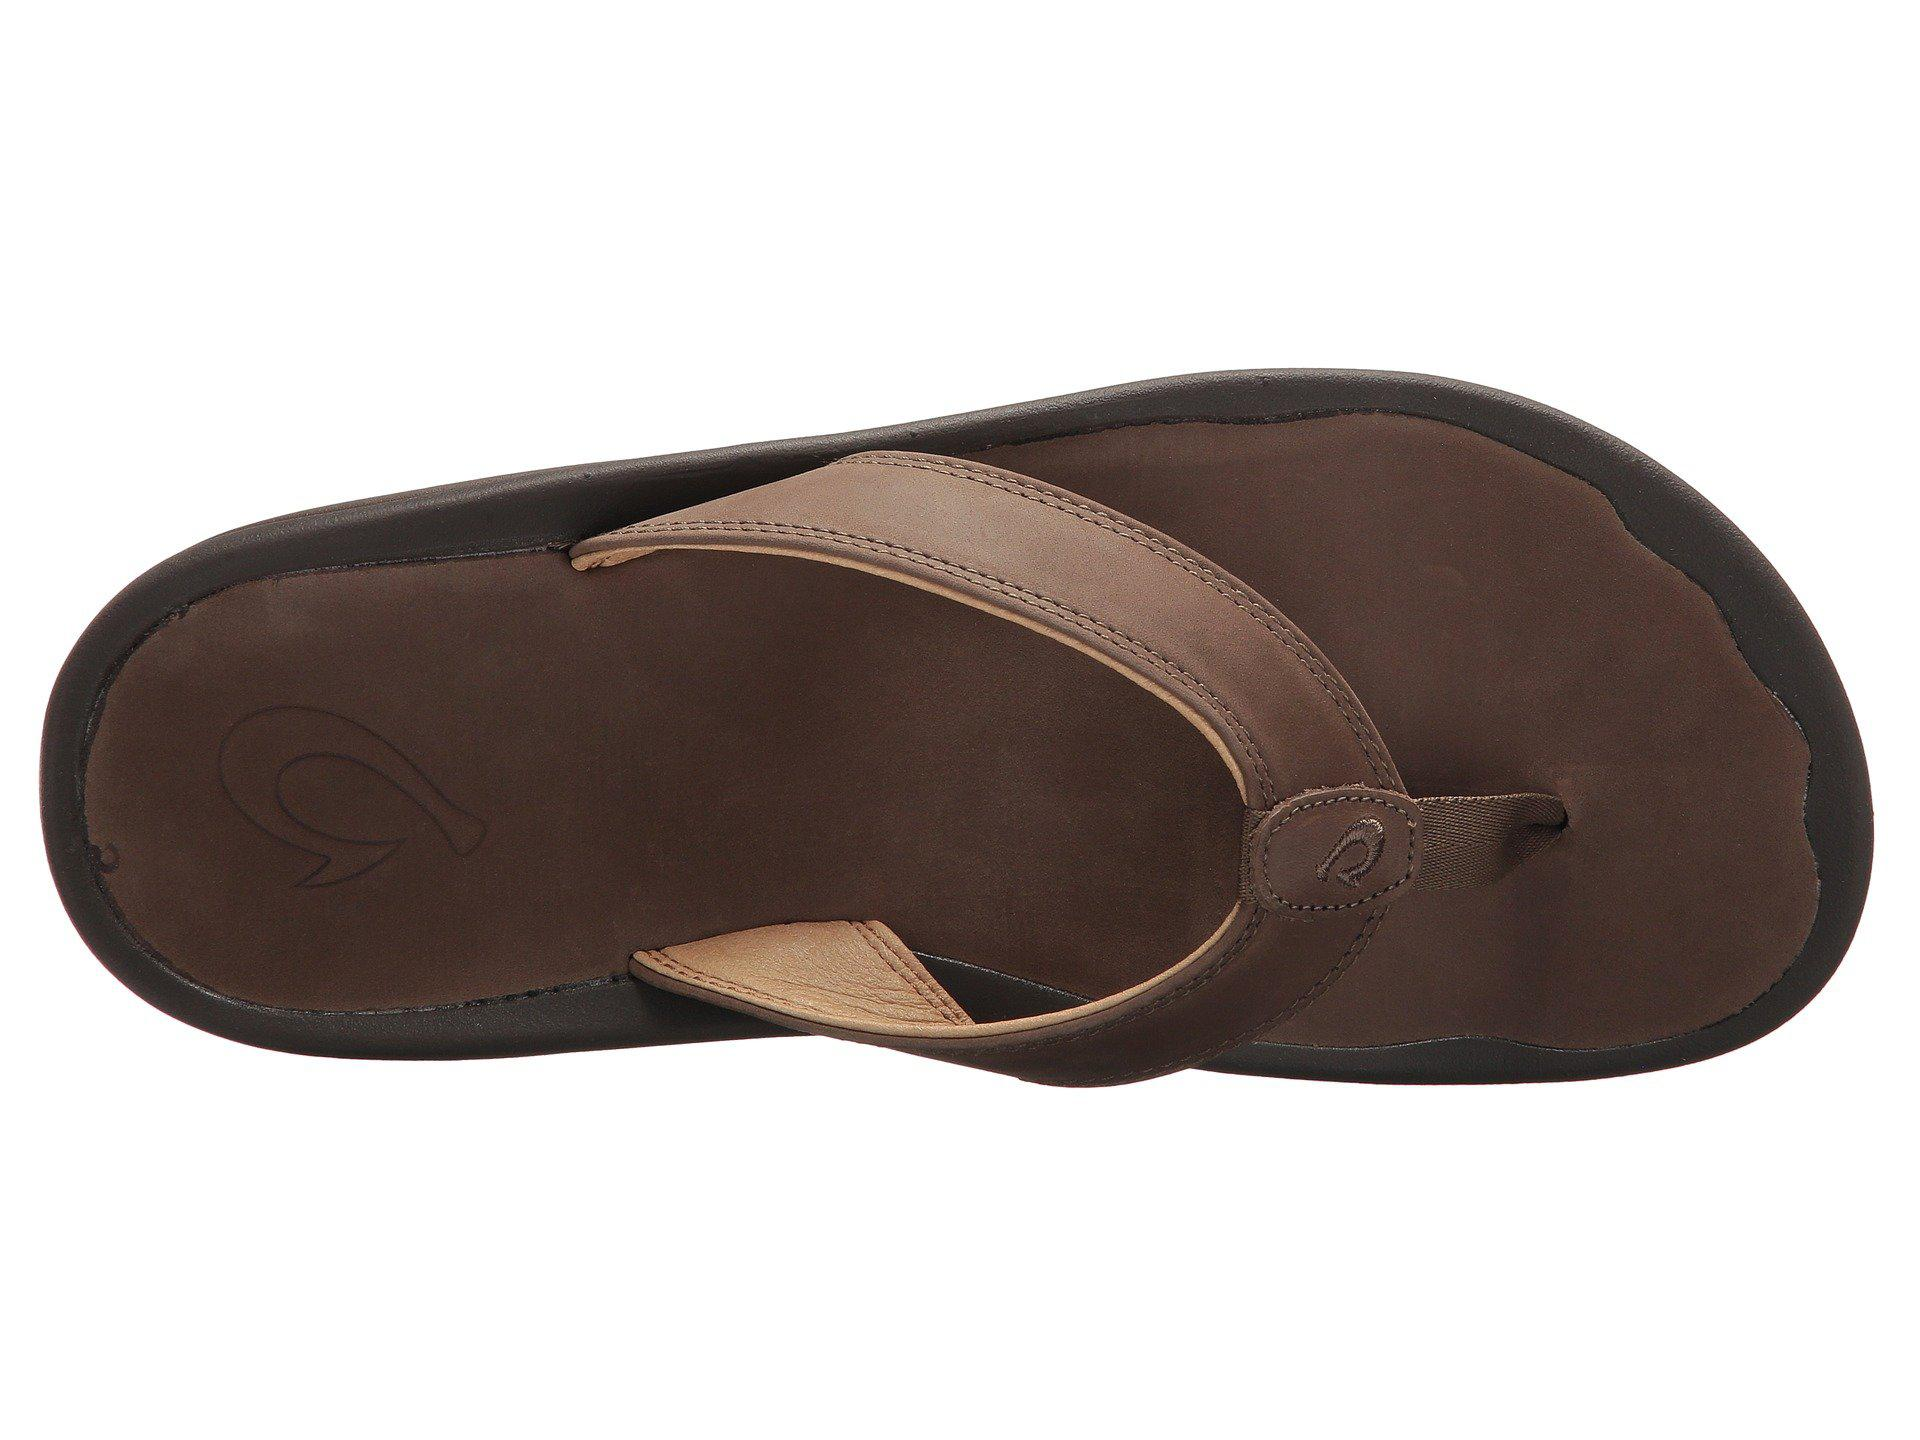 f72fffc6fab2 Lyst - Olukai  ohana  ili (mustang mustang) Men s Sandals in Brown ...